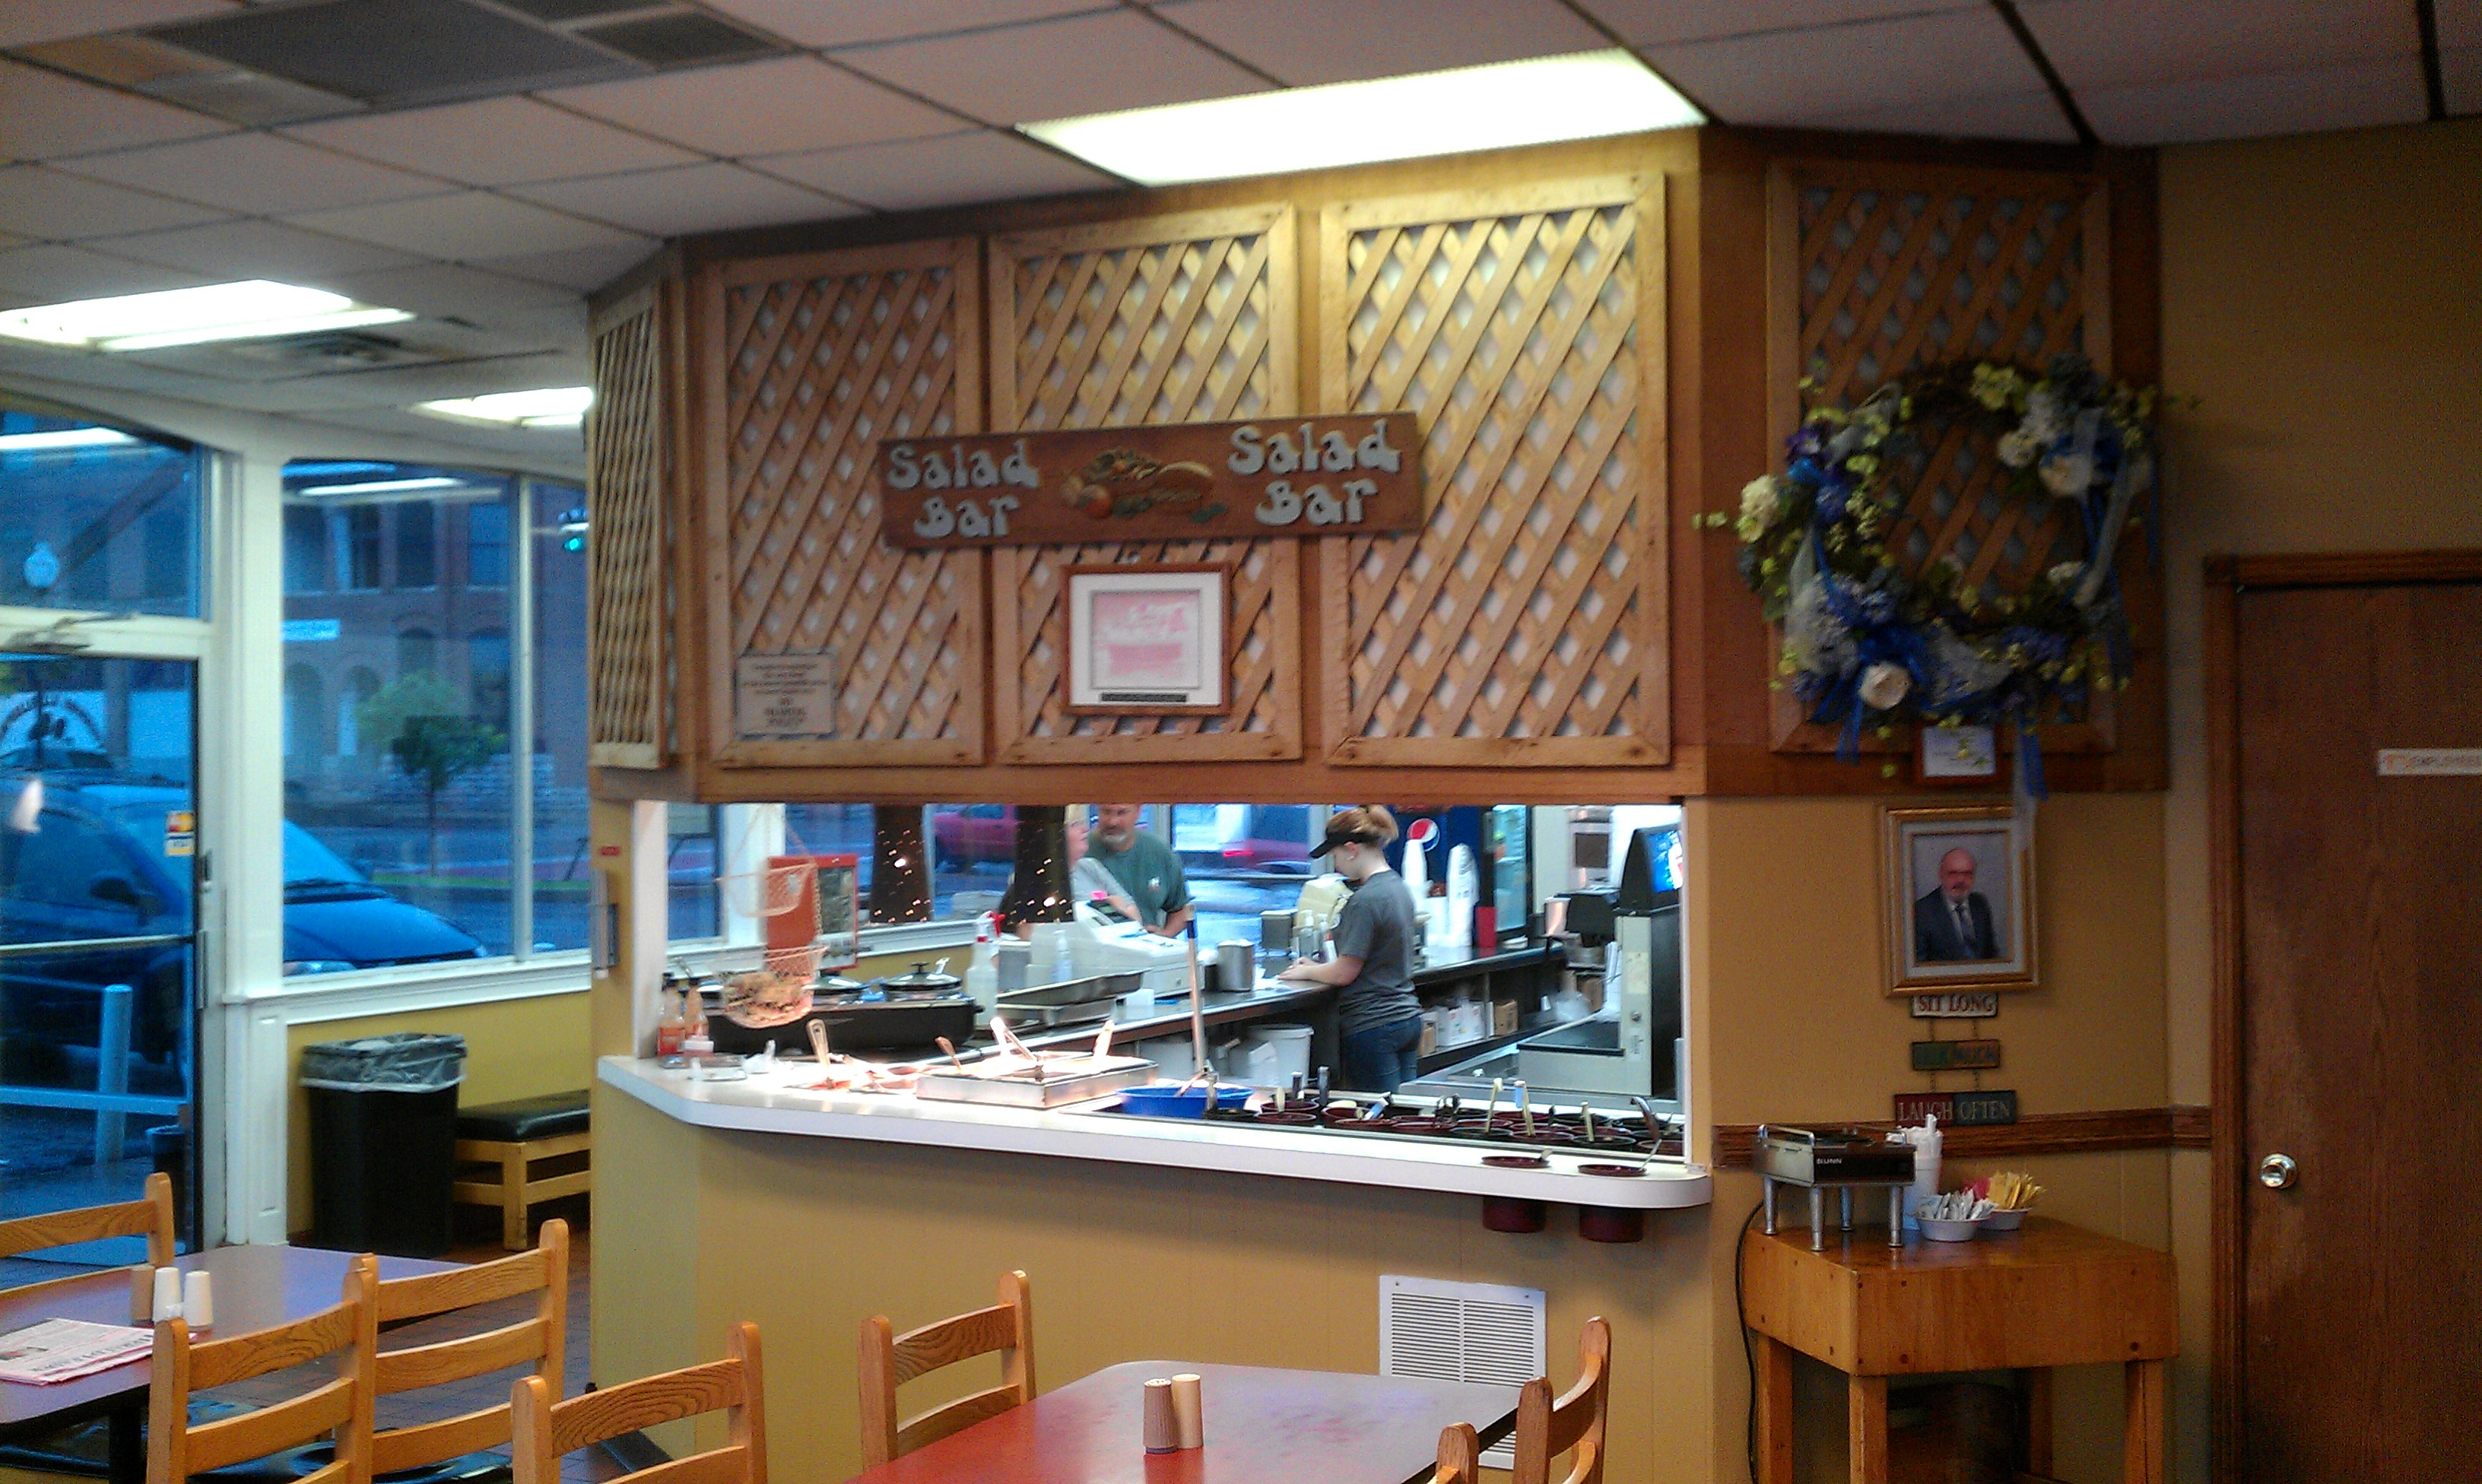 Druther S Restaurant Campbellsville Ky